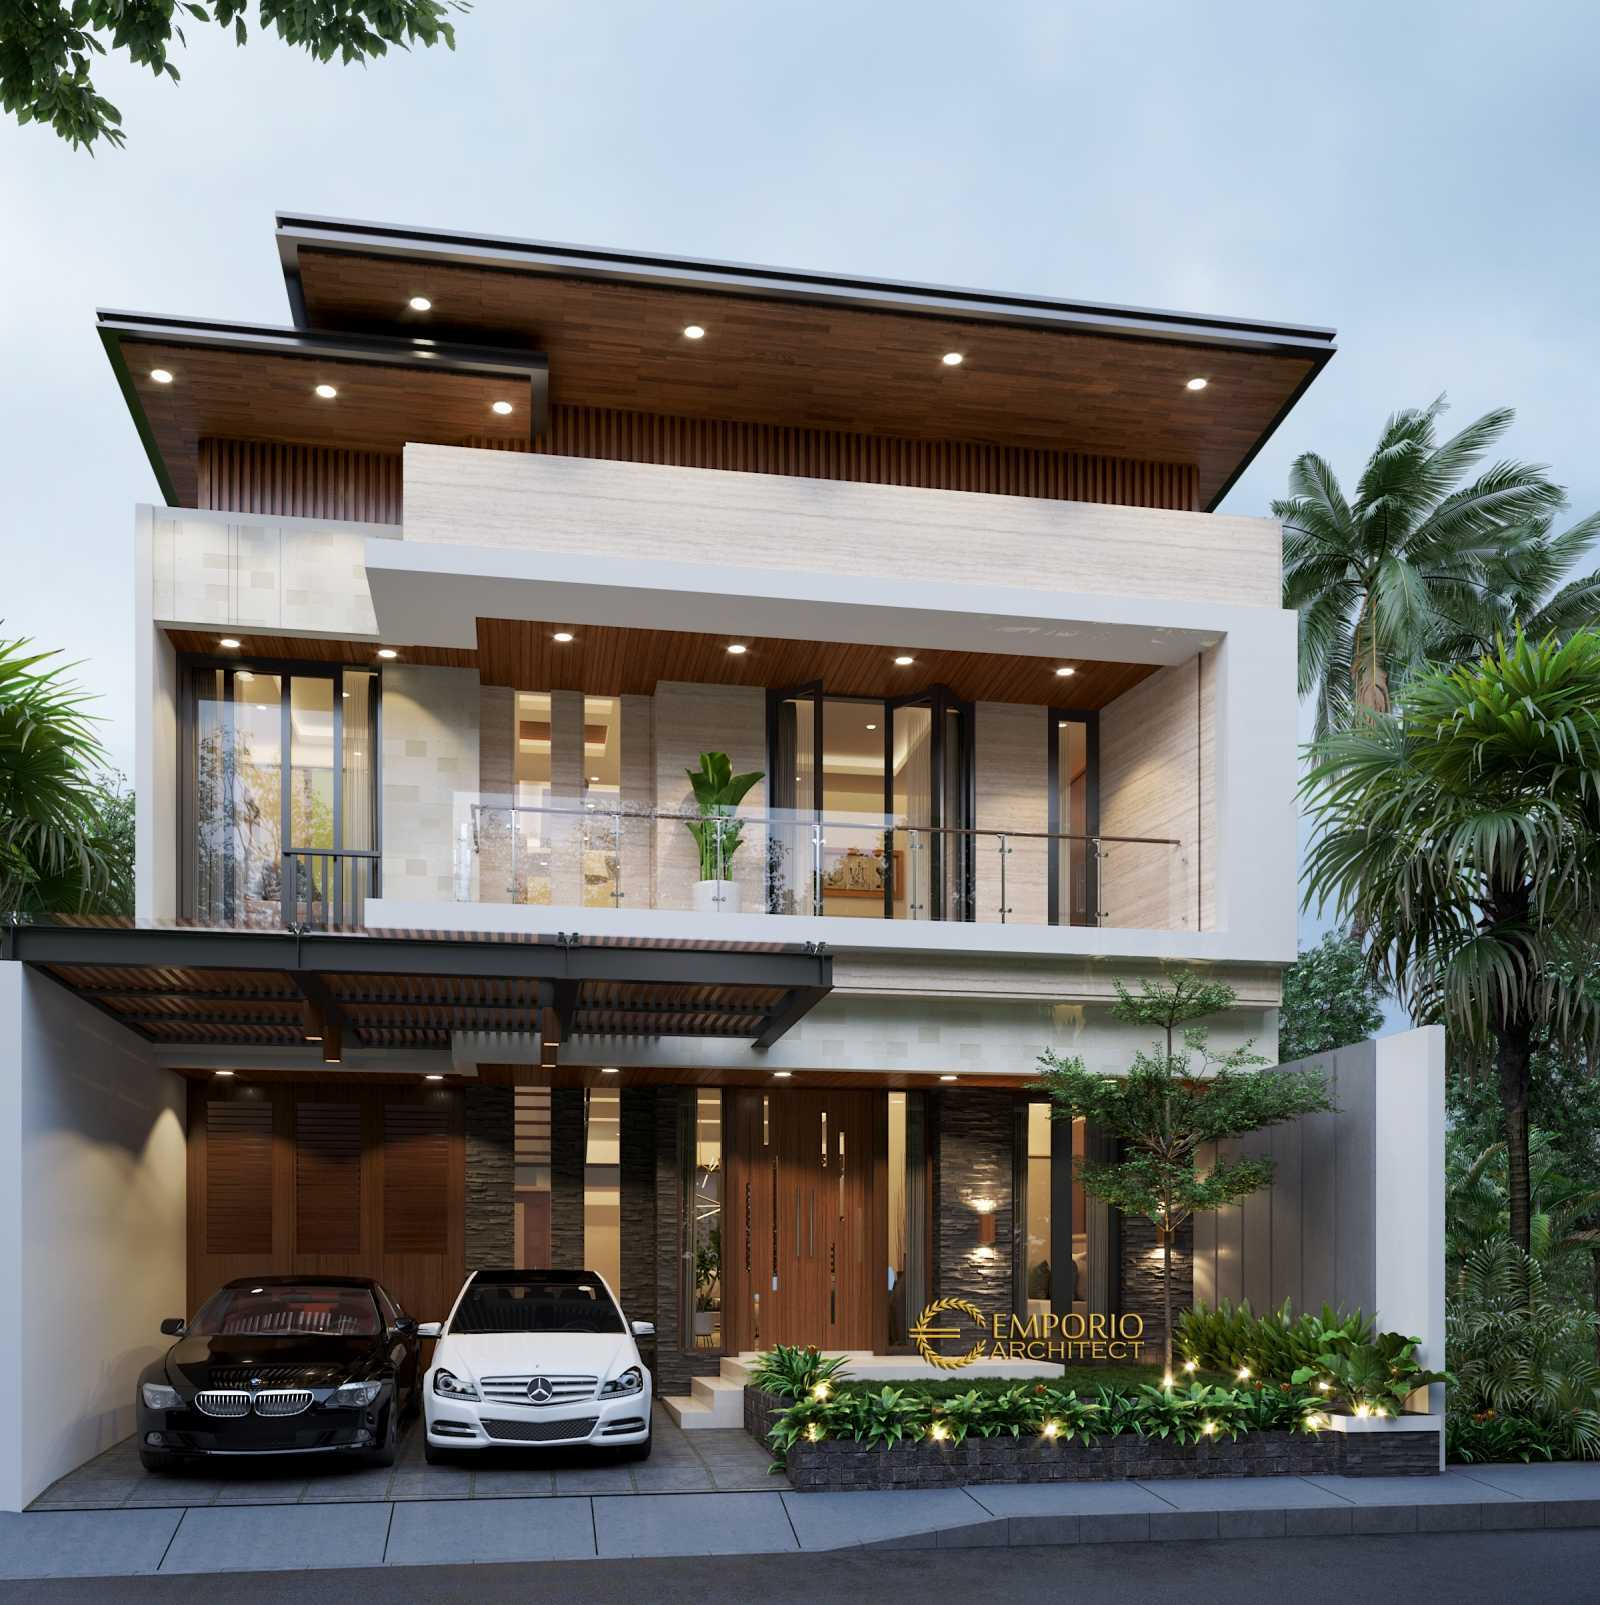 Emporio Architect Jasa Arsitek Jakarta Timur Desain Rumah Modern Tropis 625 @ Jakarta Timur Jakarta Timur, Kota Jakarta Timur, Daerah Khusus Ibukota Jakarta, Indonesia Jakarta Timur, Kota Jakarta Timur, Daerah Khusus Ibukota Jakarta, Indonesia Emporio-Architect-Jasa-Arsitek-Jakarta-Timur-Desain-Rumah-Modern-Tropis-625-Jakarta-Timur Modern 78417